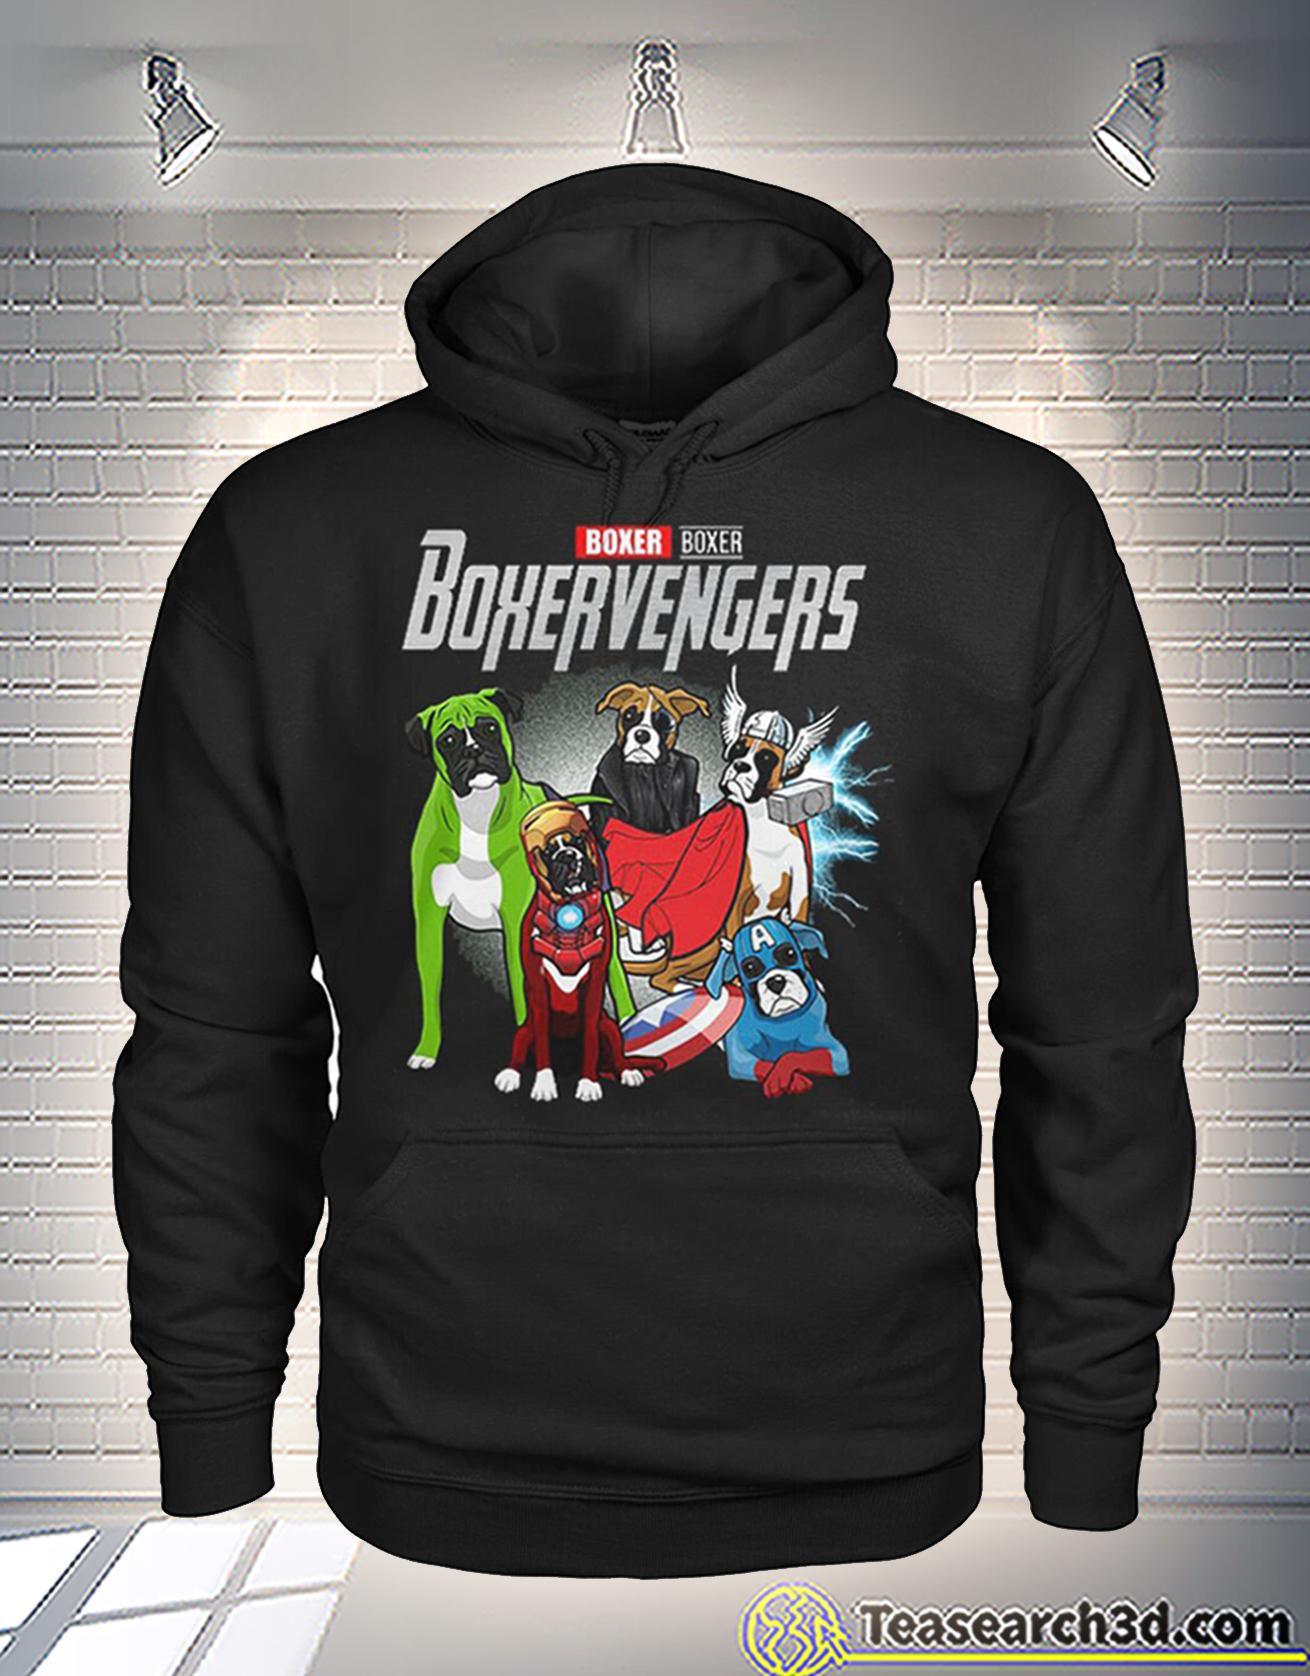 Boxer boxer boxervengers avengers hoodie